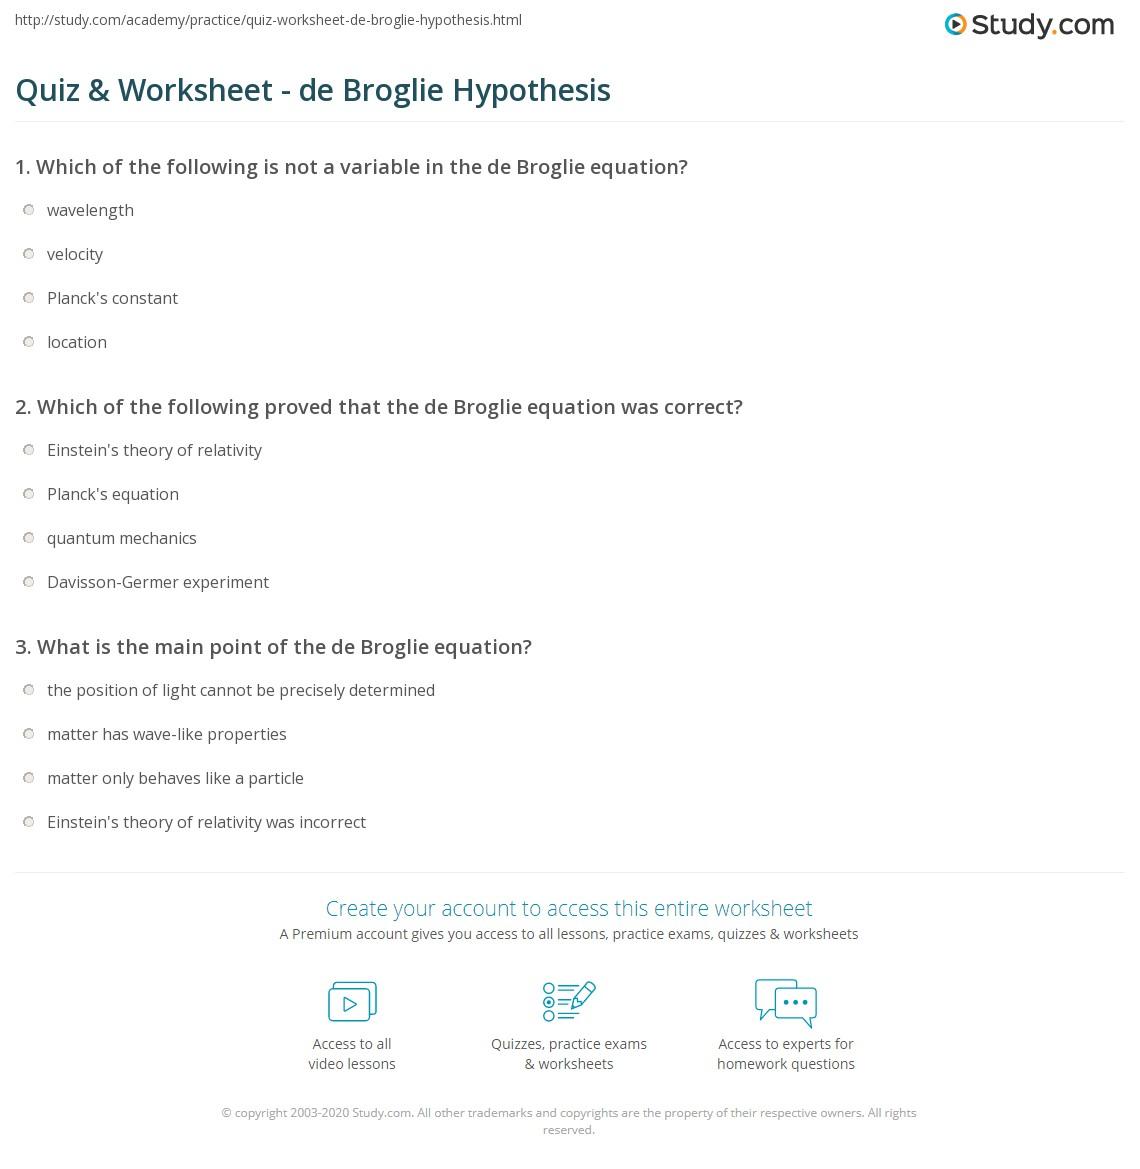 quiz worksheet de broglie hypothesis. Black Bedroom Furniture Sets. Home Design Ideas